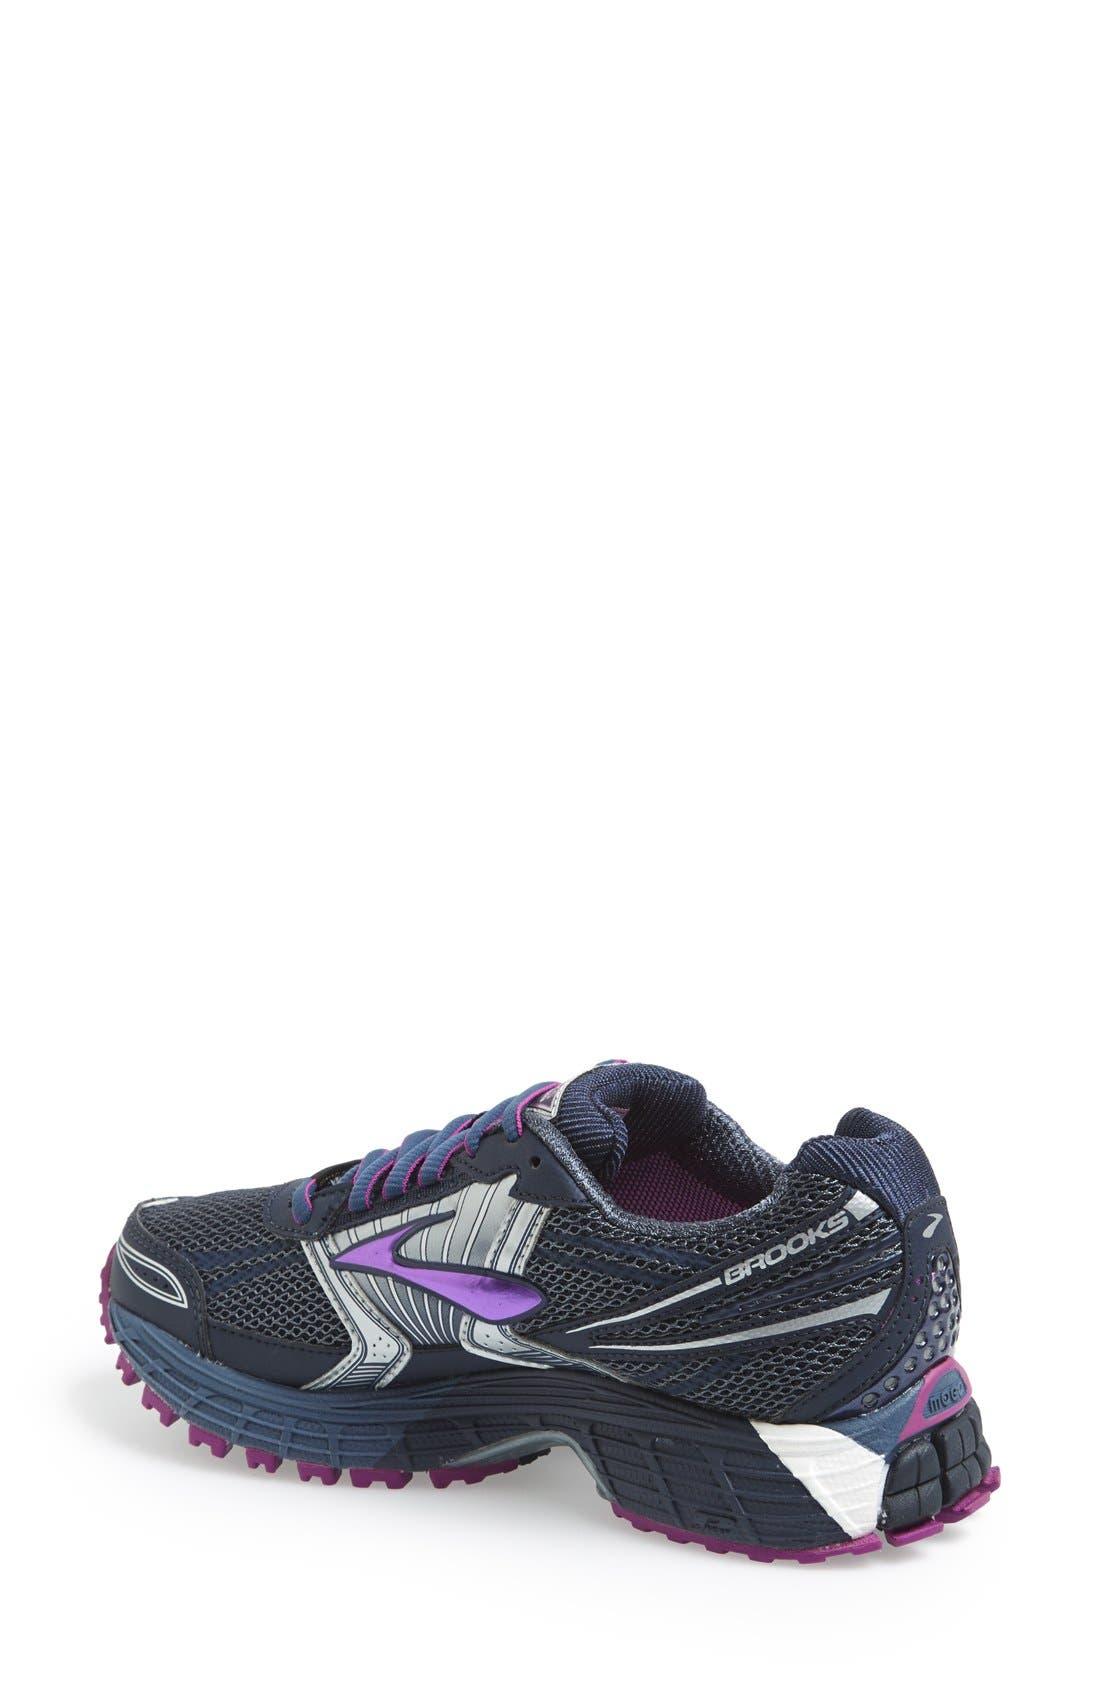 'Adrenaline ASR 11 GTX' Waterproof Running Shoe,                             Alternate thumbnail 2, color,                             021